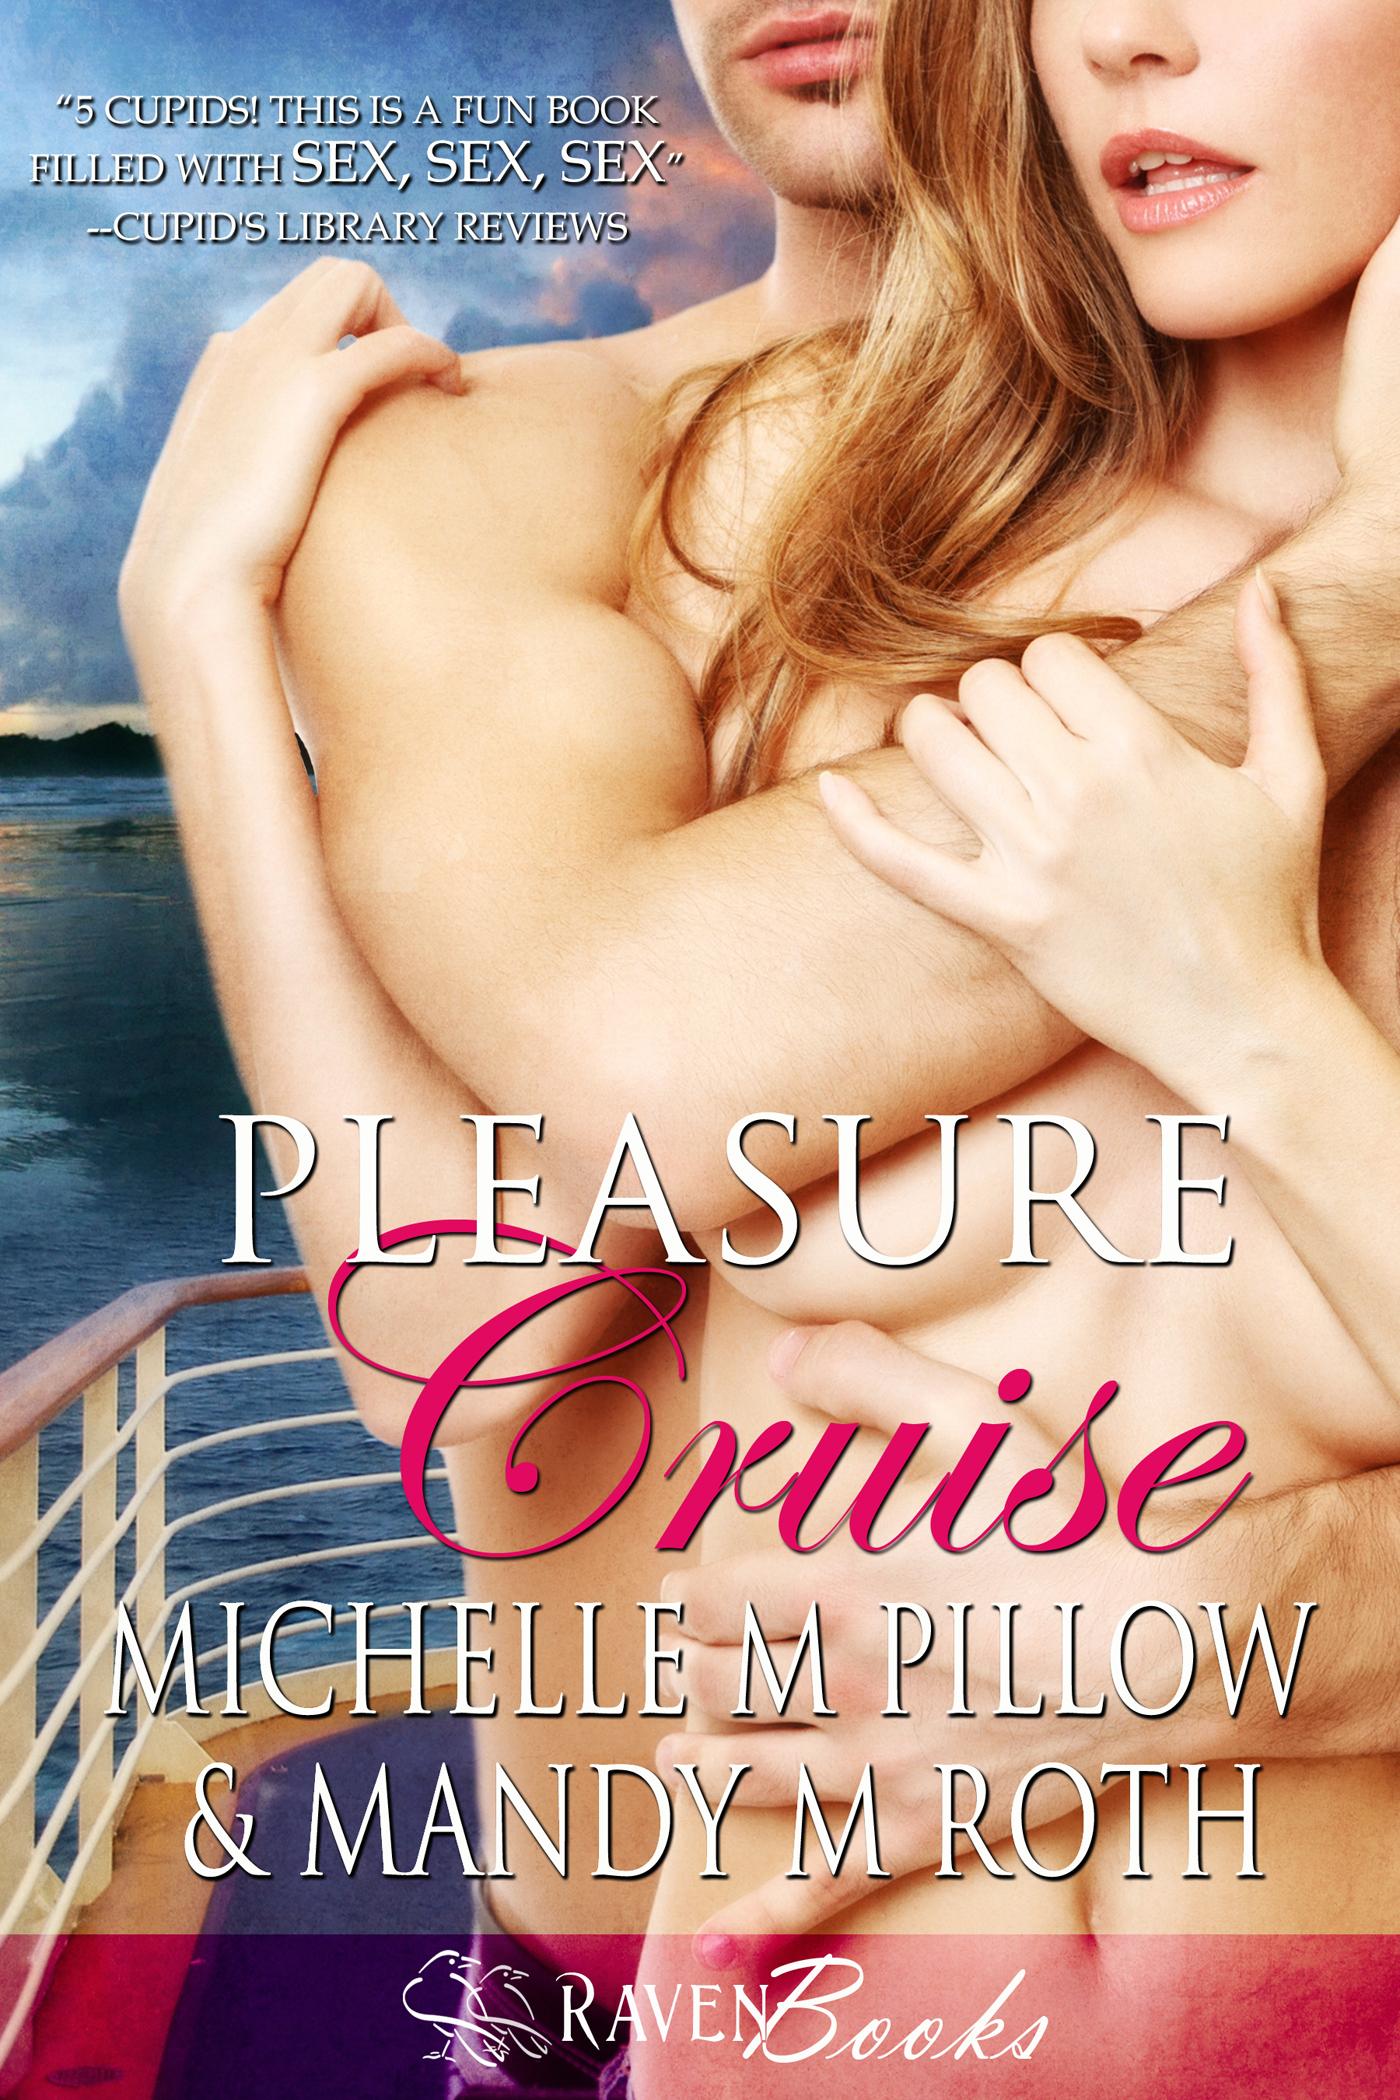 Mandy M. Roth - Pleasure Cruise